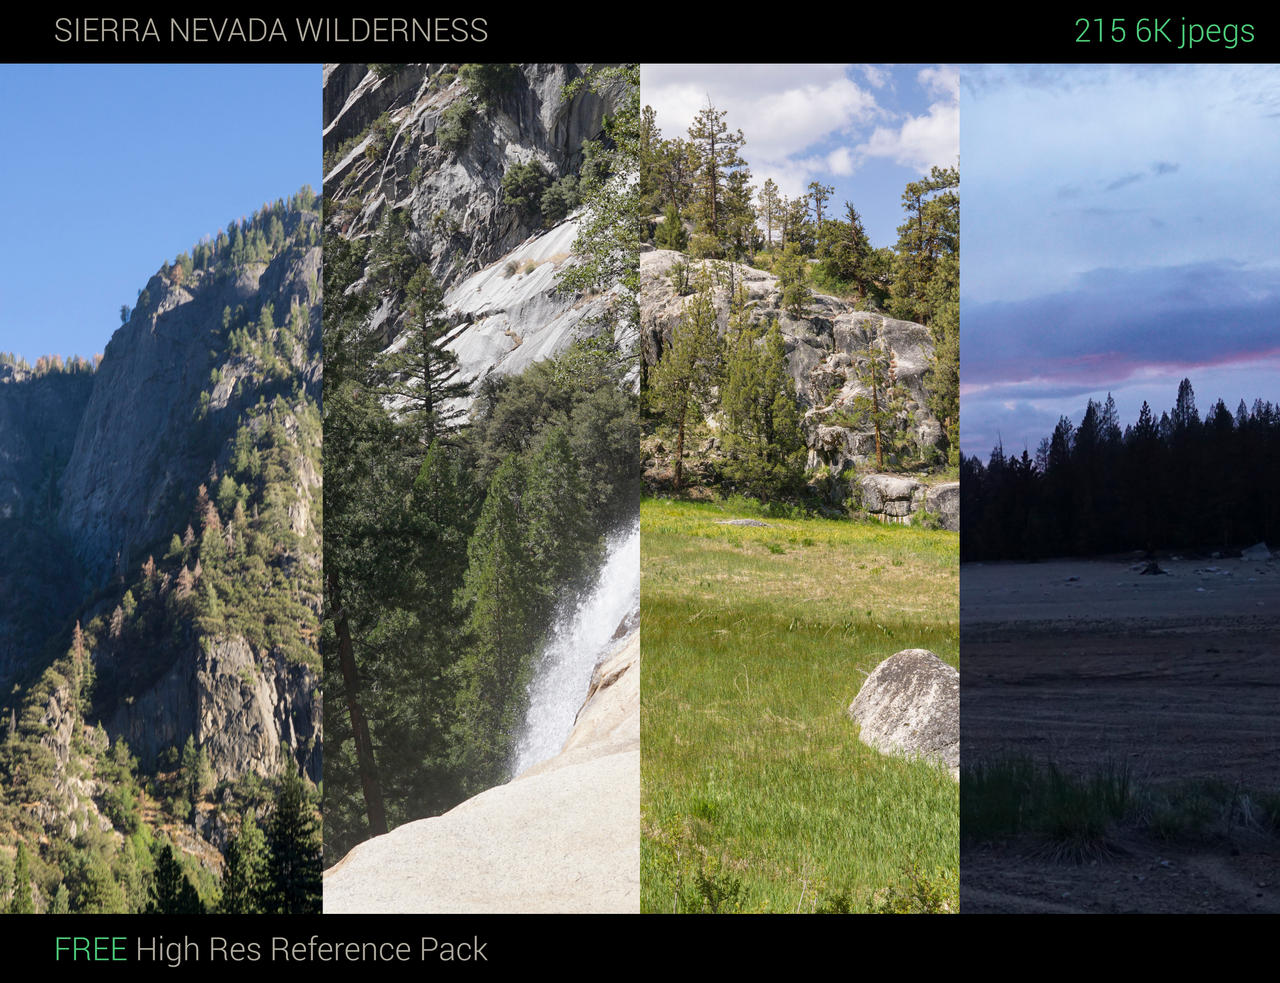 Sierra Nevada Wilderness Reference Pack by jonathanguzi